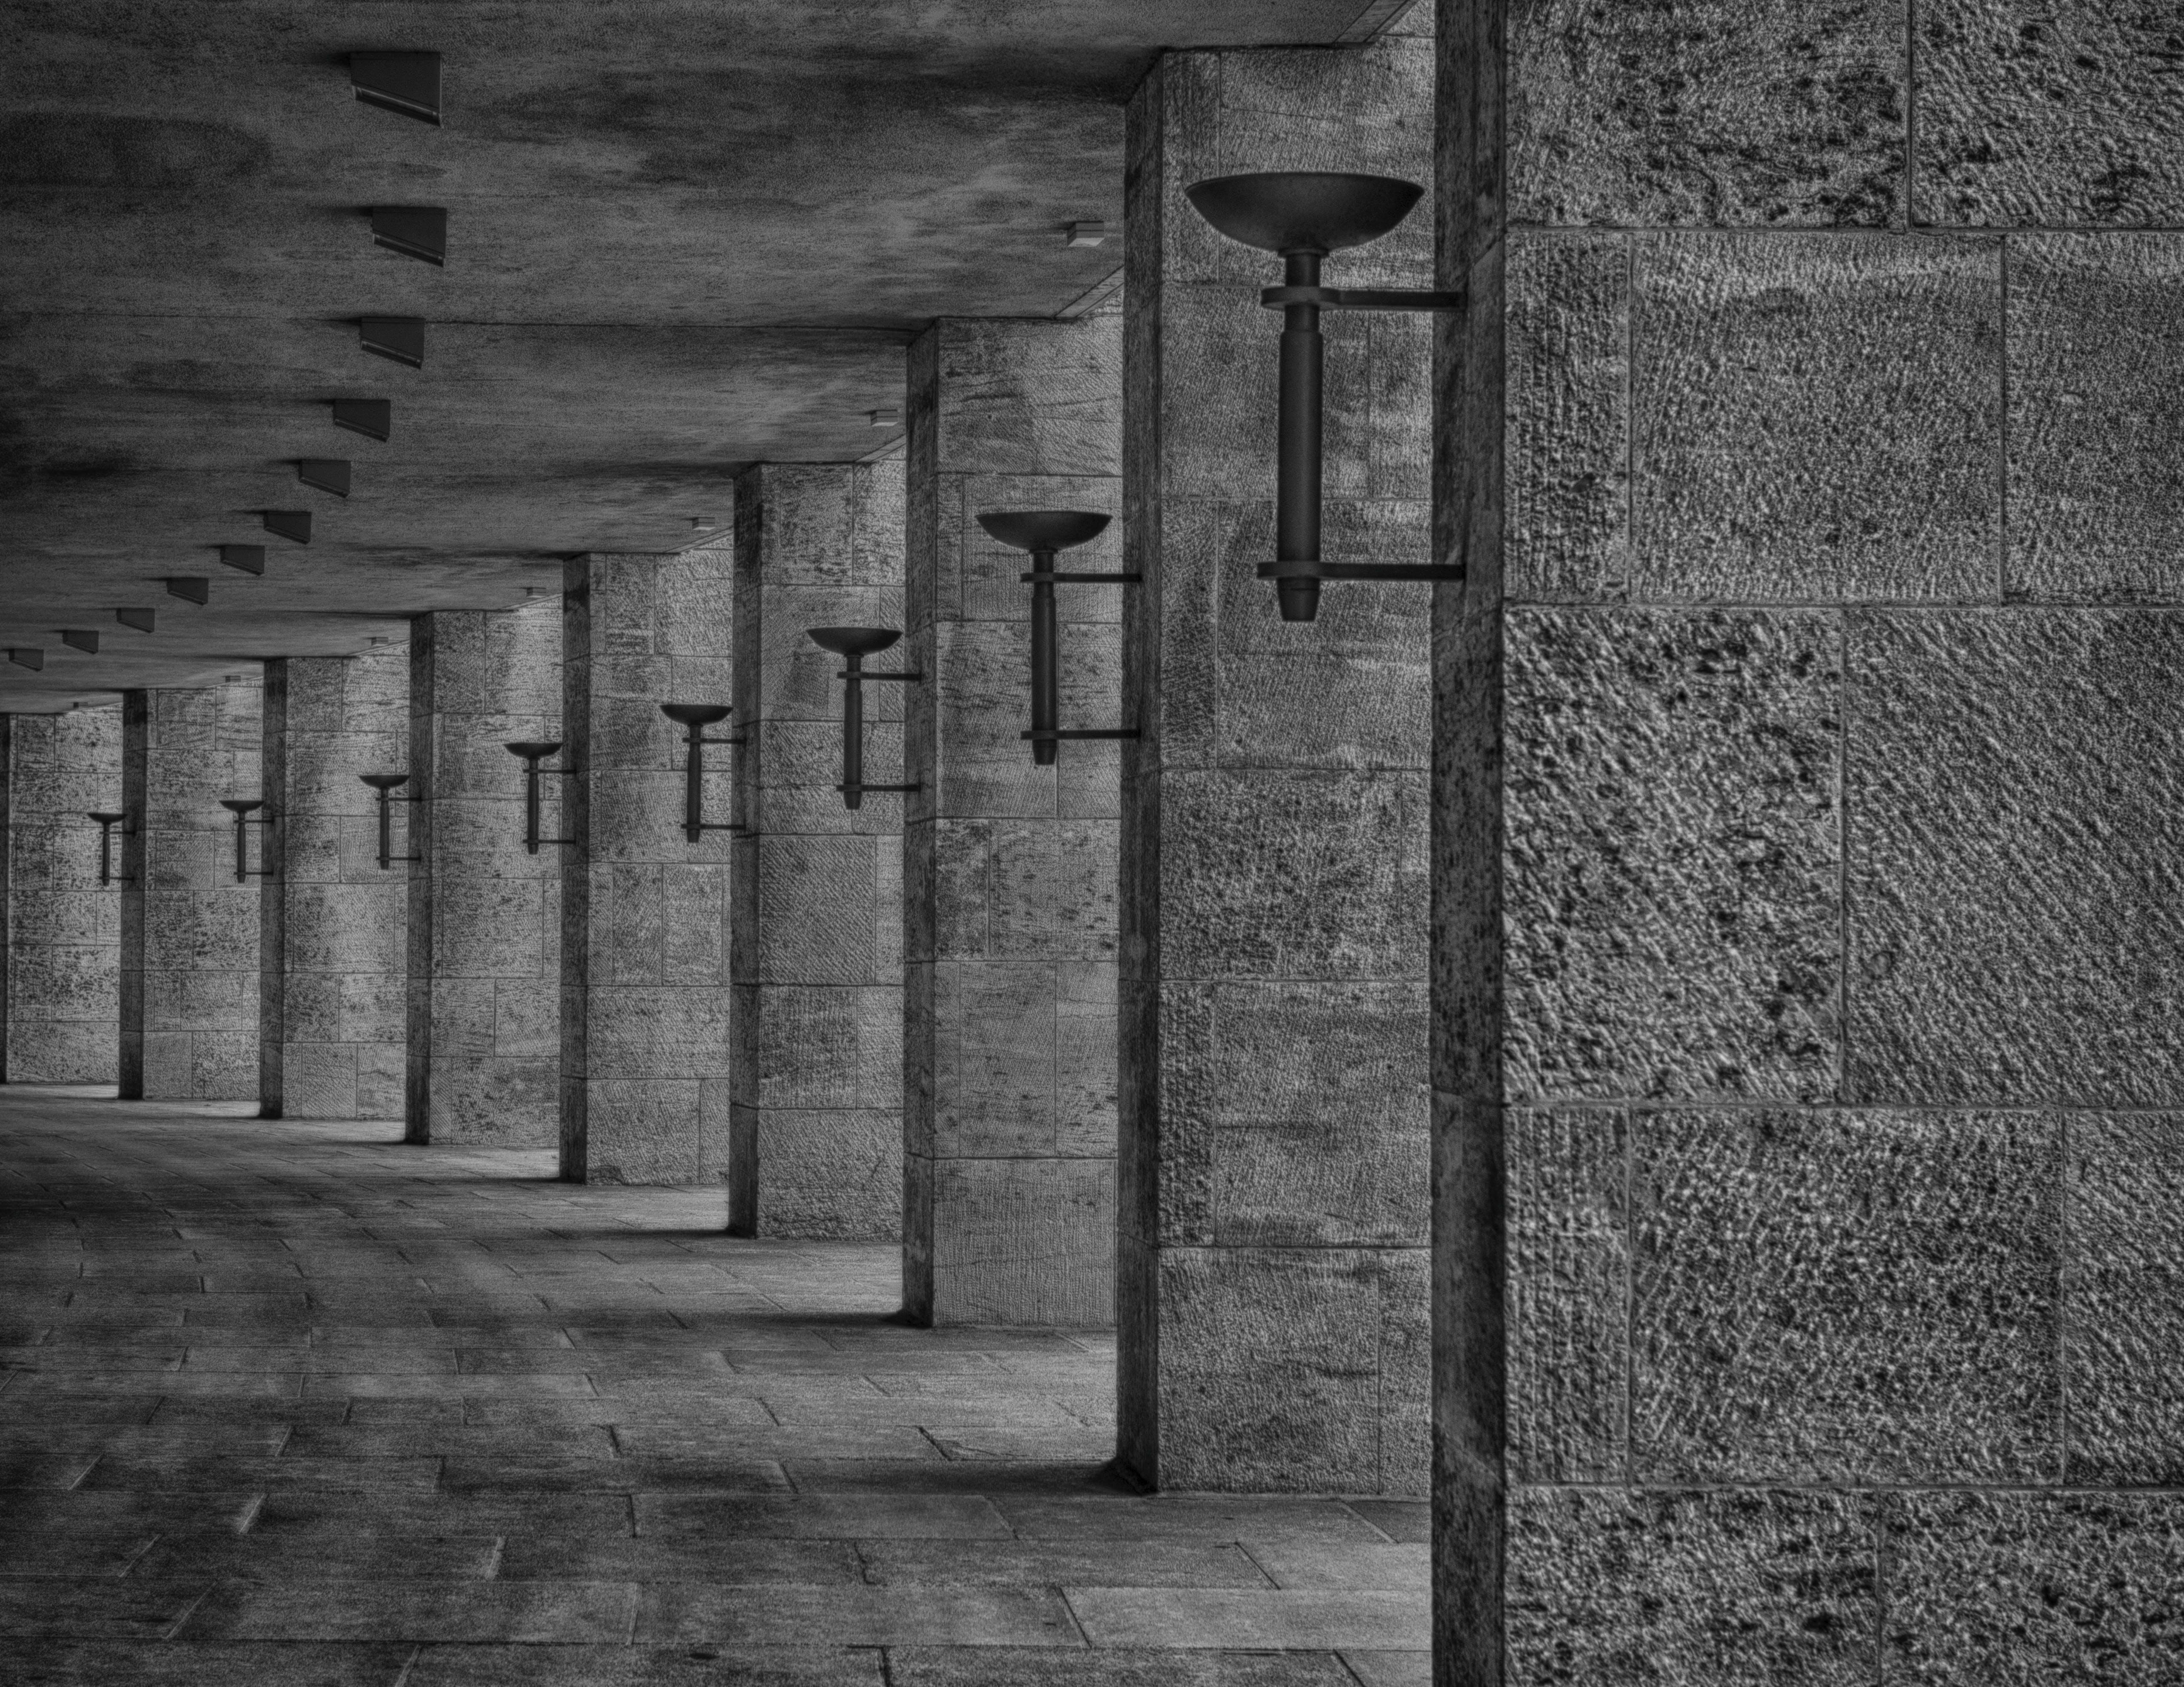 architecture, art, black and white